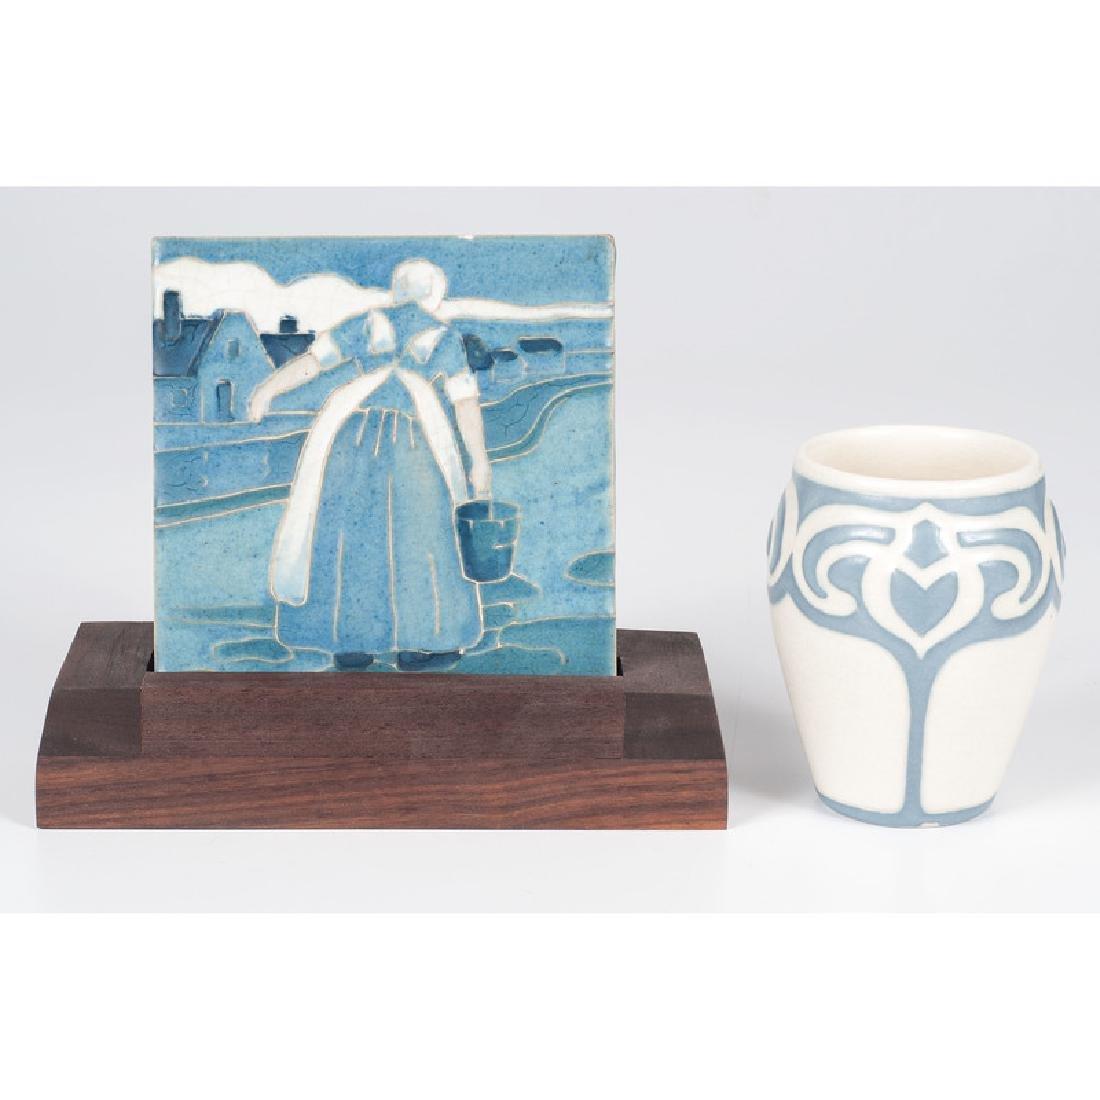 Rookwood Vellum Vase and Trivet